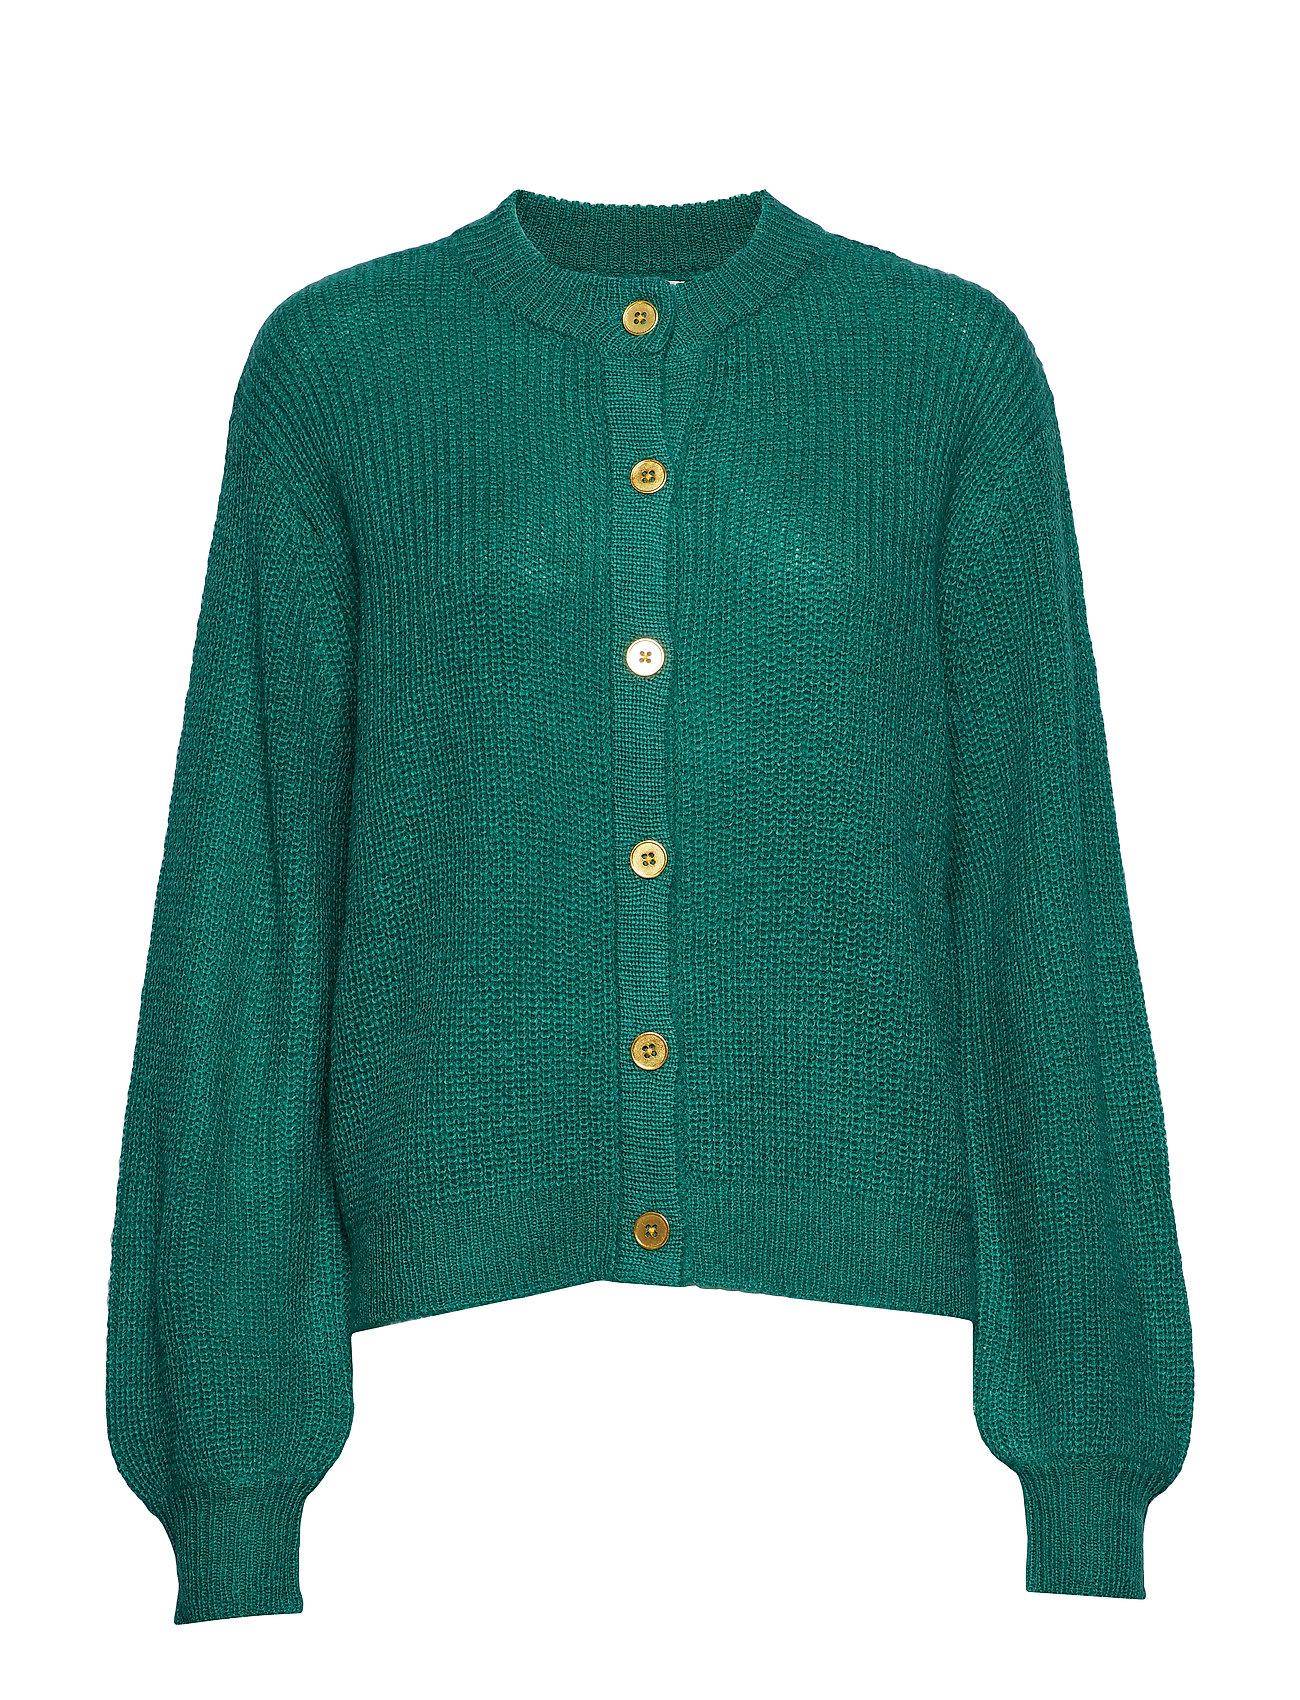 Lollys Laundry Nanna Cardigan - GREEN